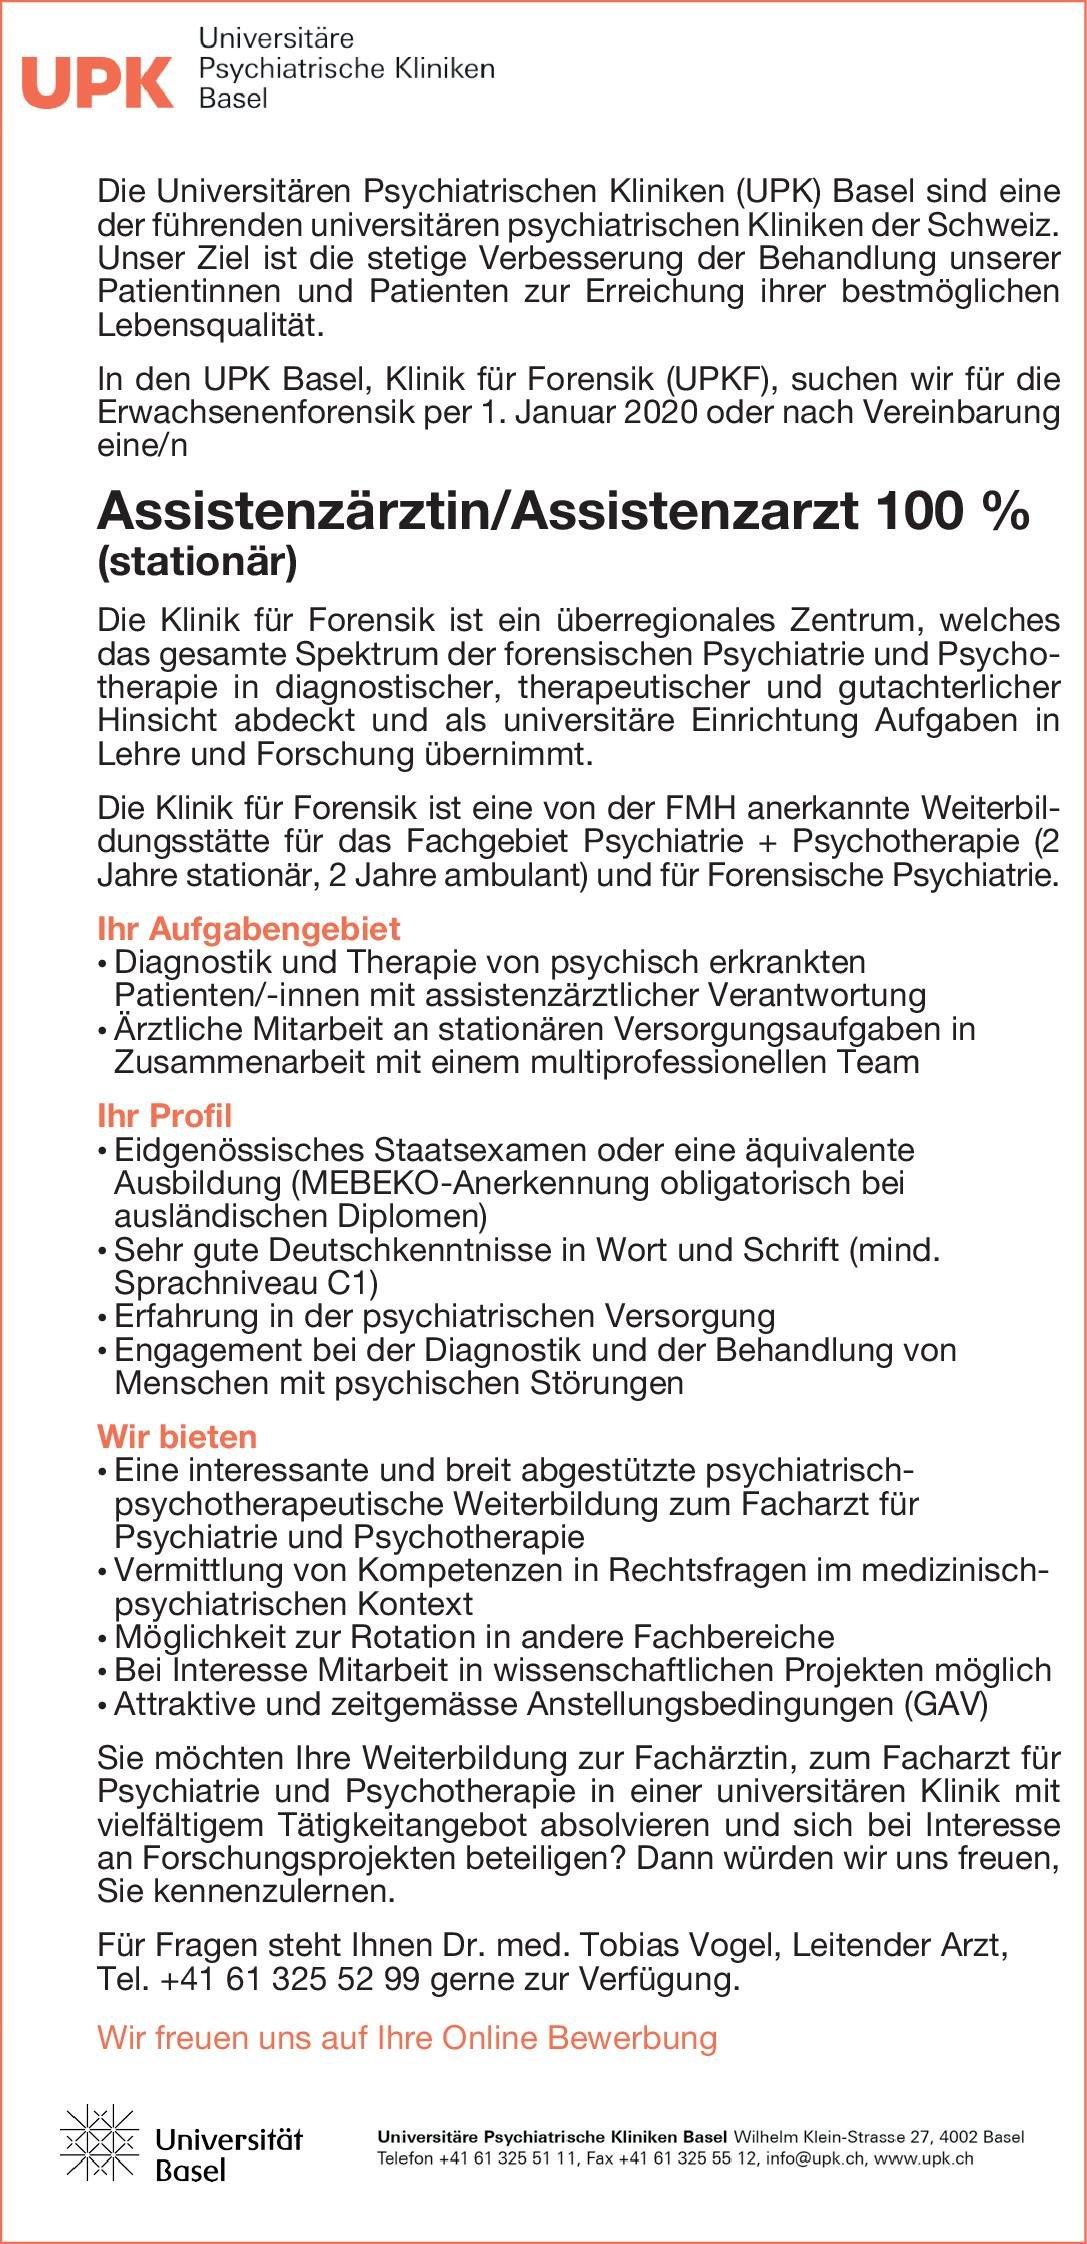 UPK Universitäre Psychiatrische Kliniken Basel Assistenzärztin/Assistenzarzt 100 % (stationär)  Psychiatrie und Psychotherapie, Psychiatrie und Psychotherapie Assistenzarzt / Arzt in Weiterbildung